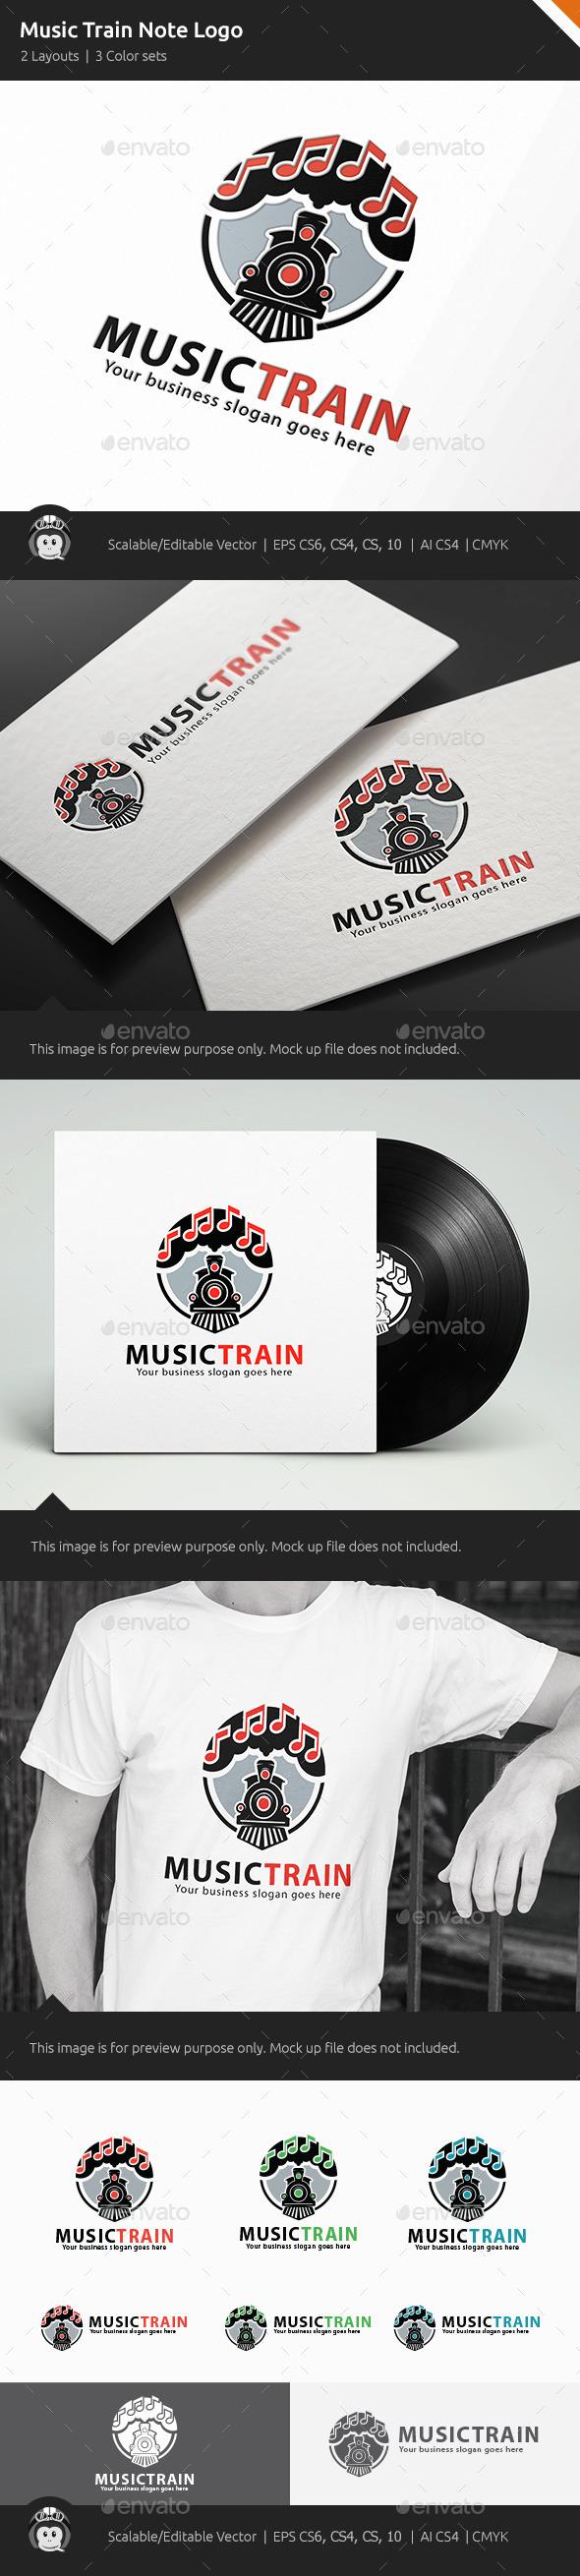 Music Train Note Logo